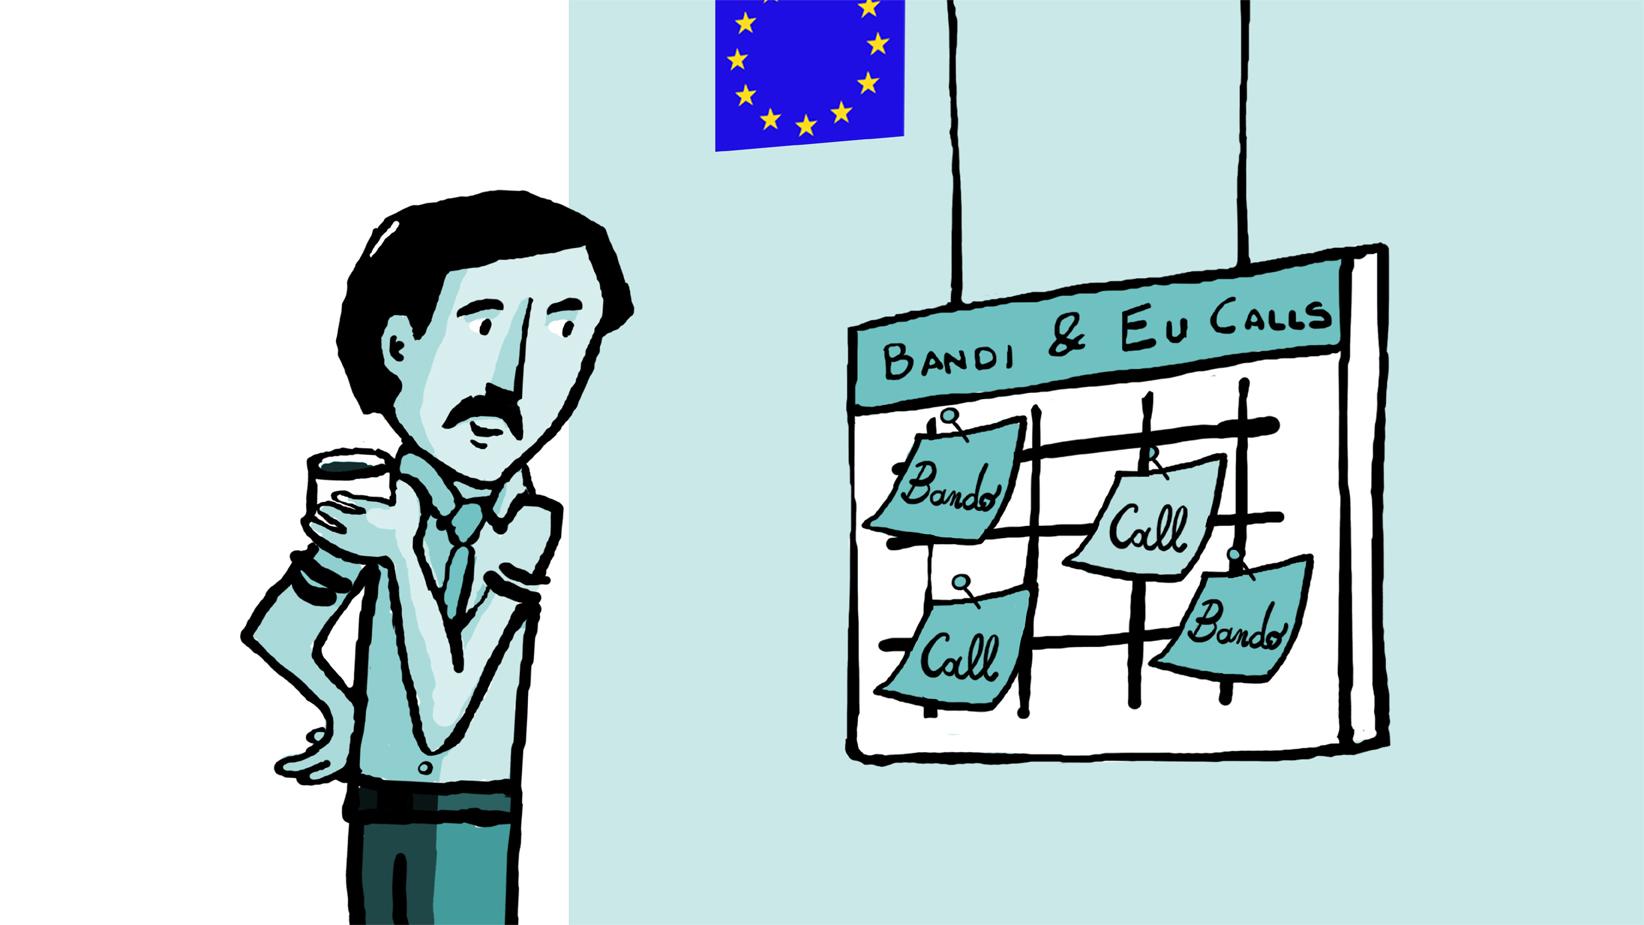 Fenice-Green-Energy-Park-Master-Finanziamenti-Europei-Advanced